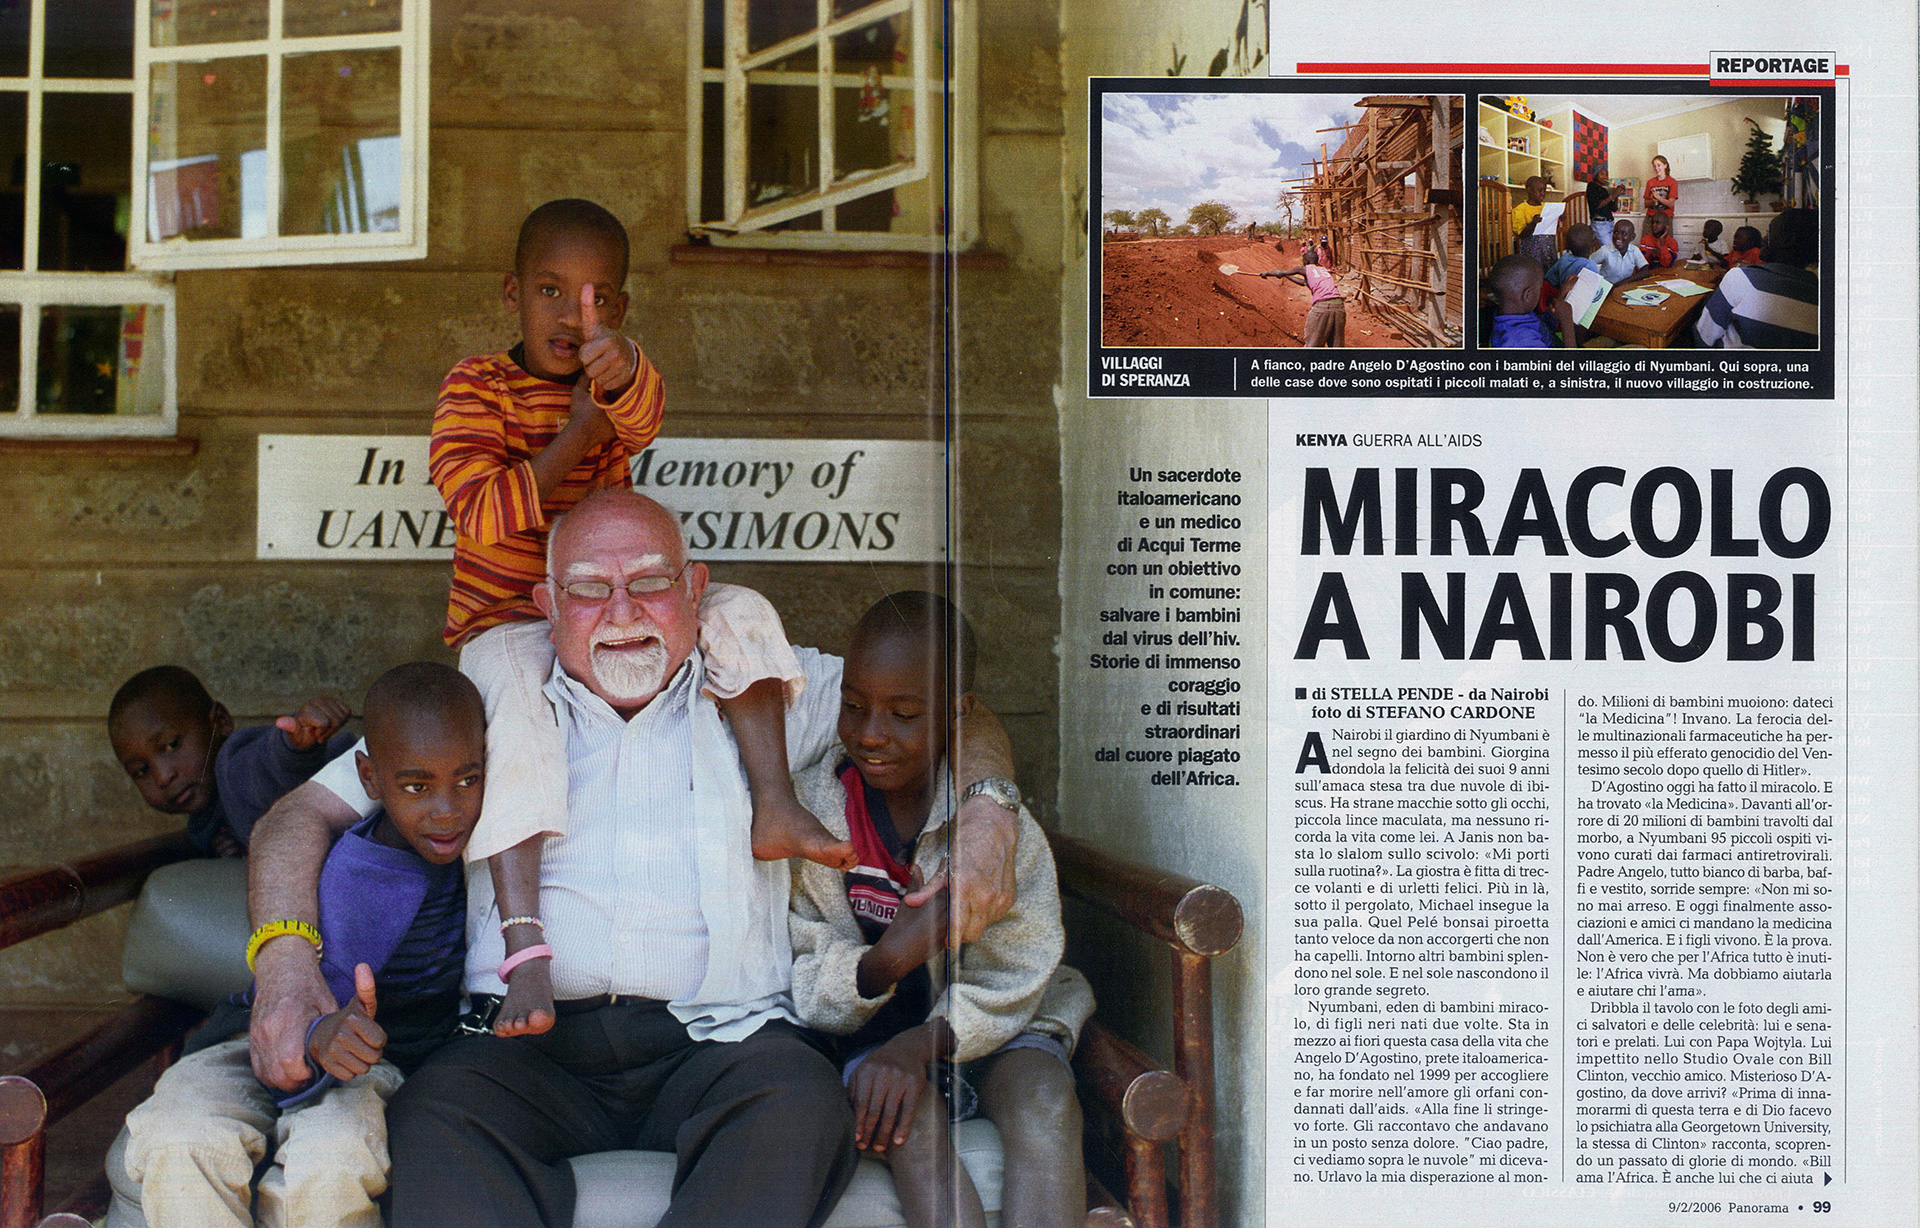 Nairobi - Padre Angelo D'agostino: Stefano Cardone Photographer Reportage